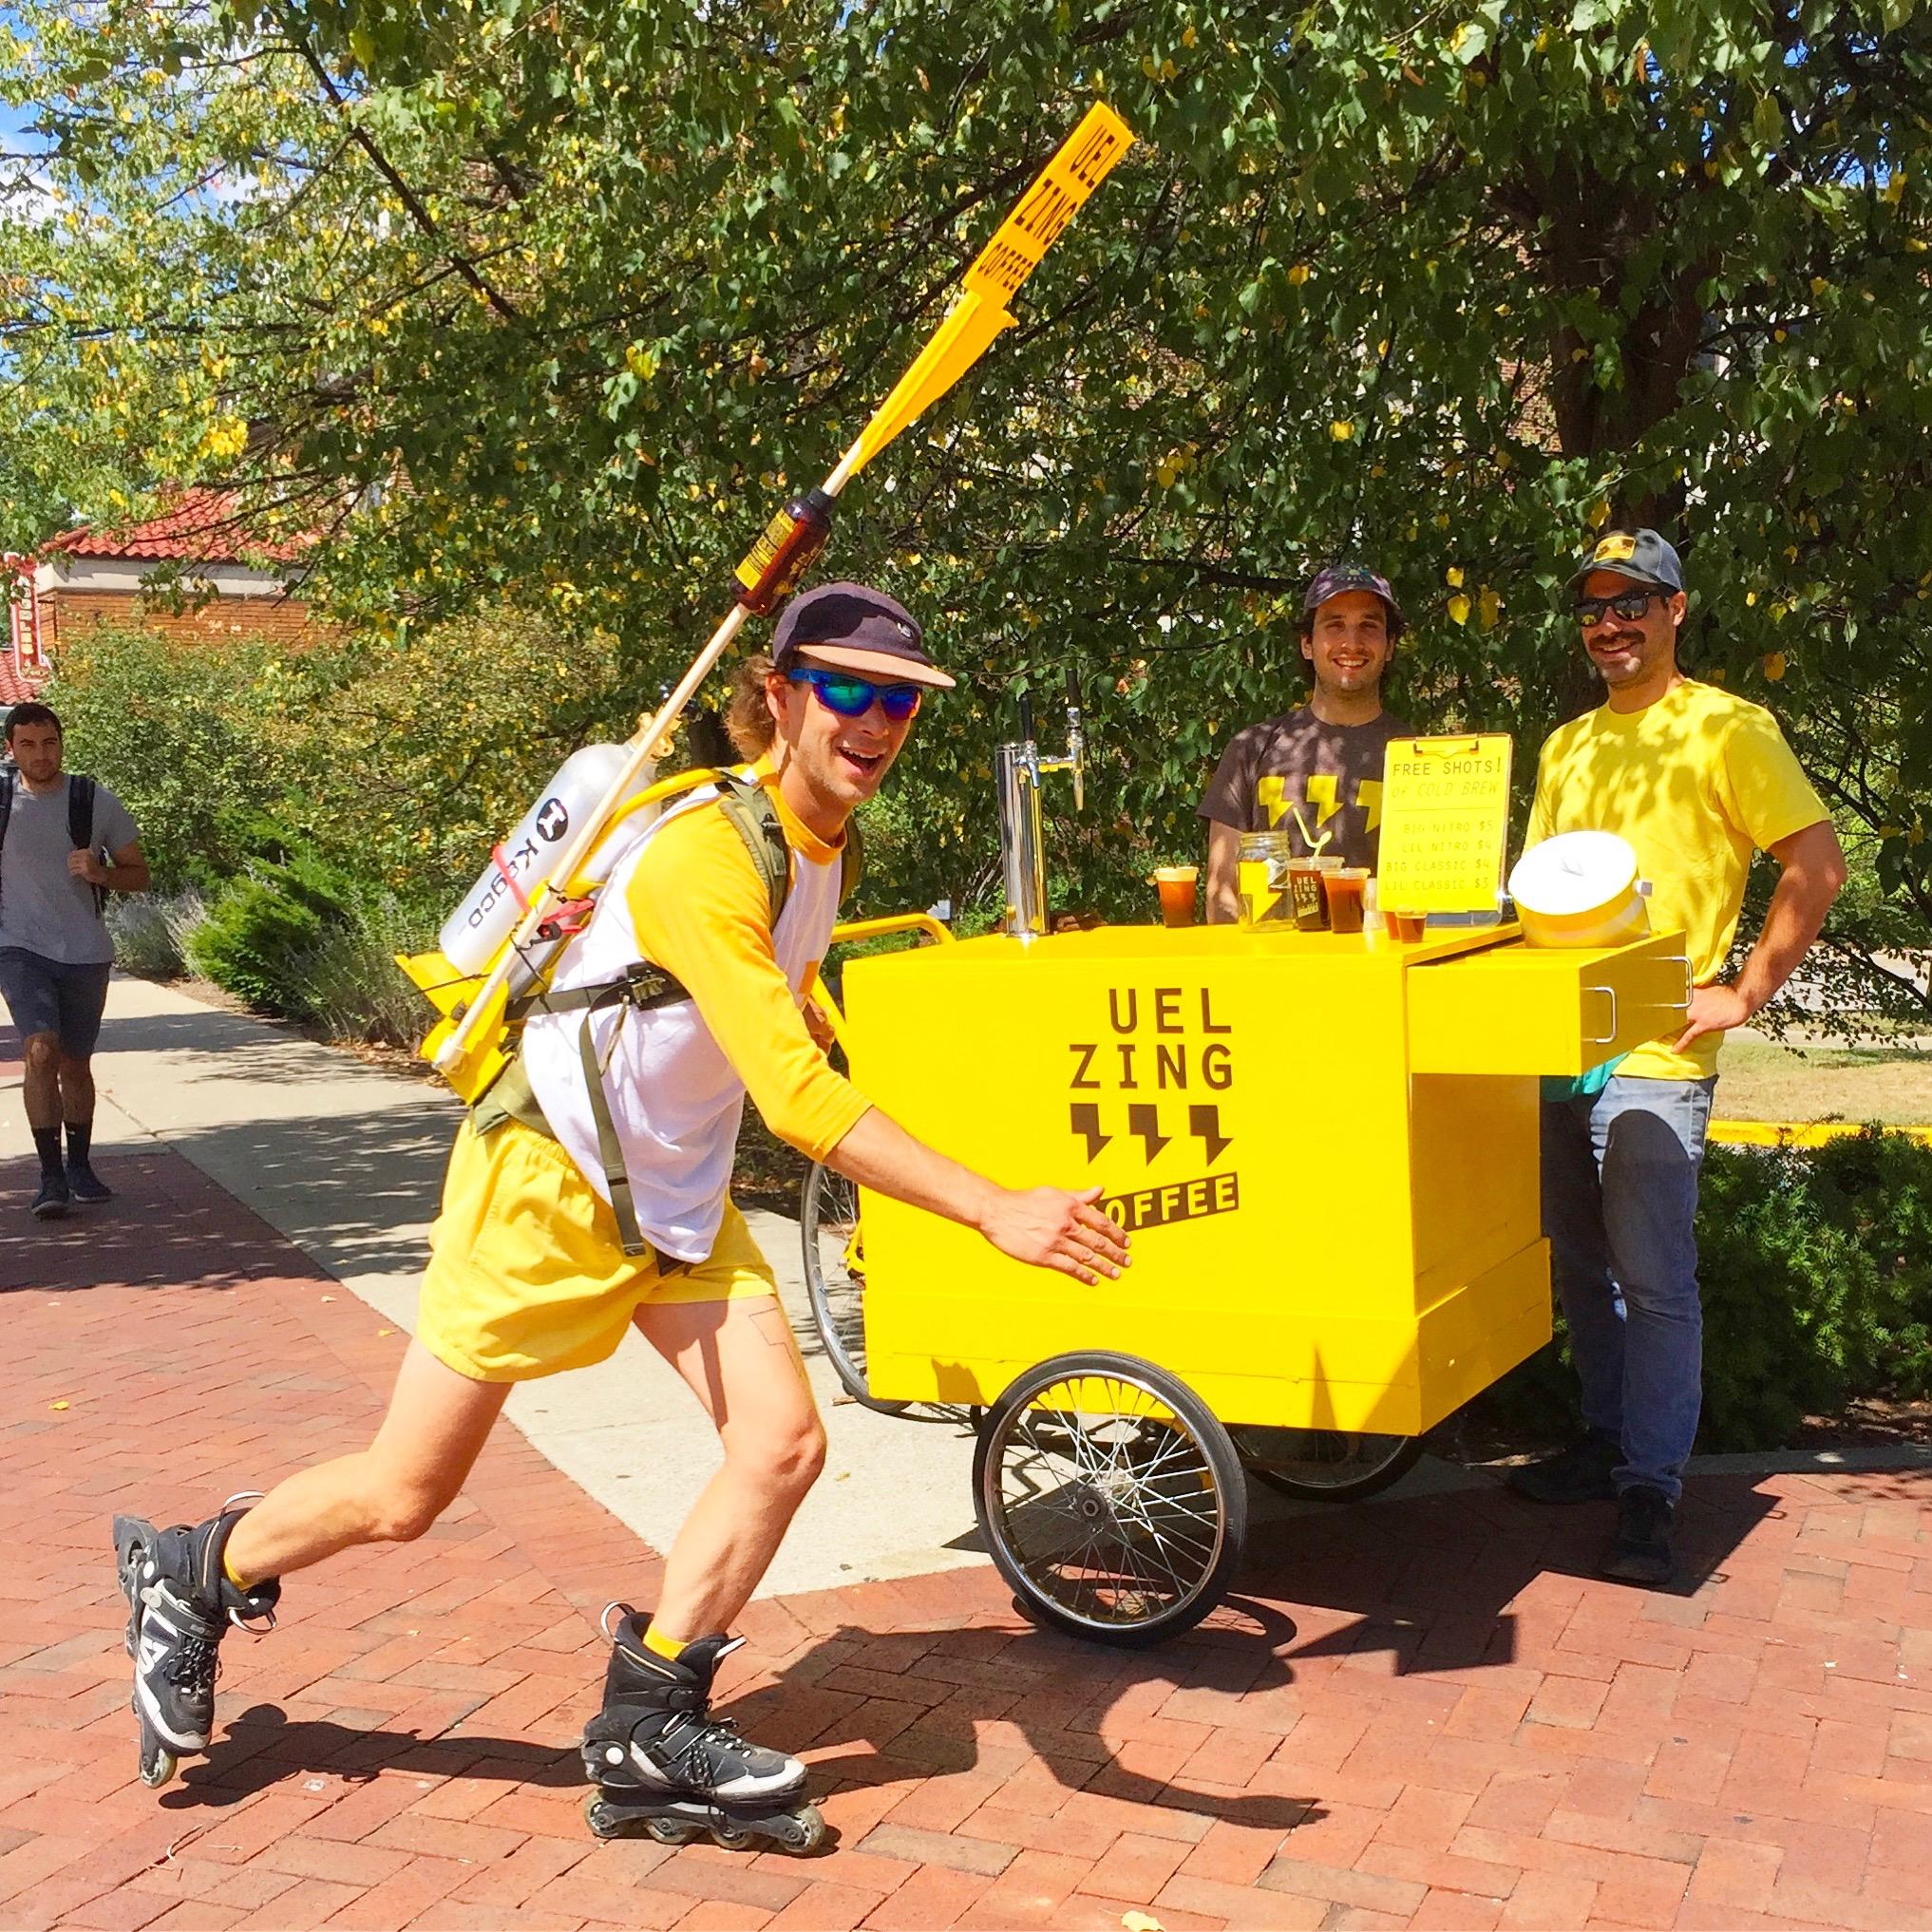 Uel Zing Coffee Cart and Rollerblades.JPG